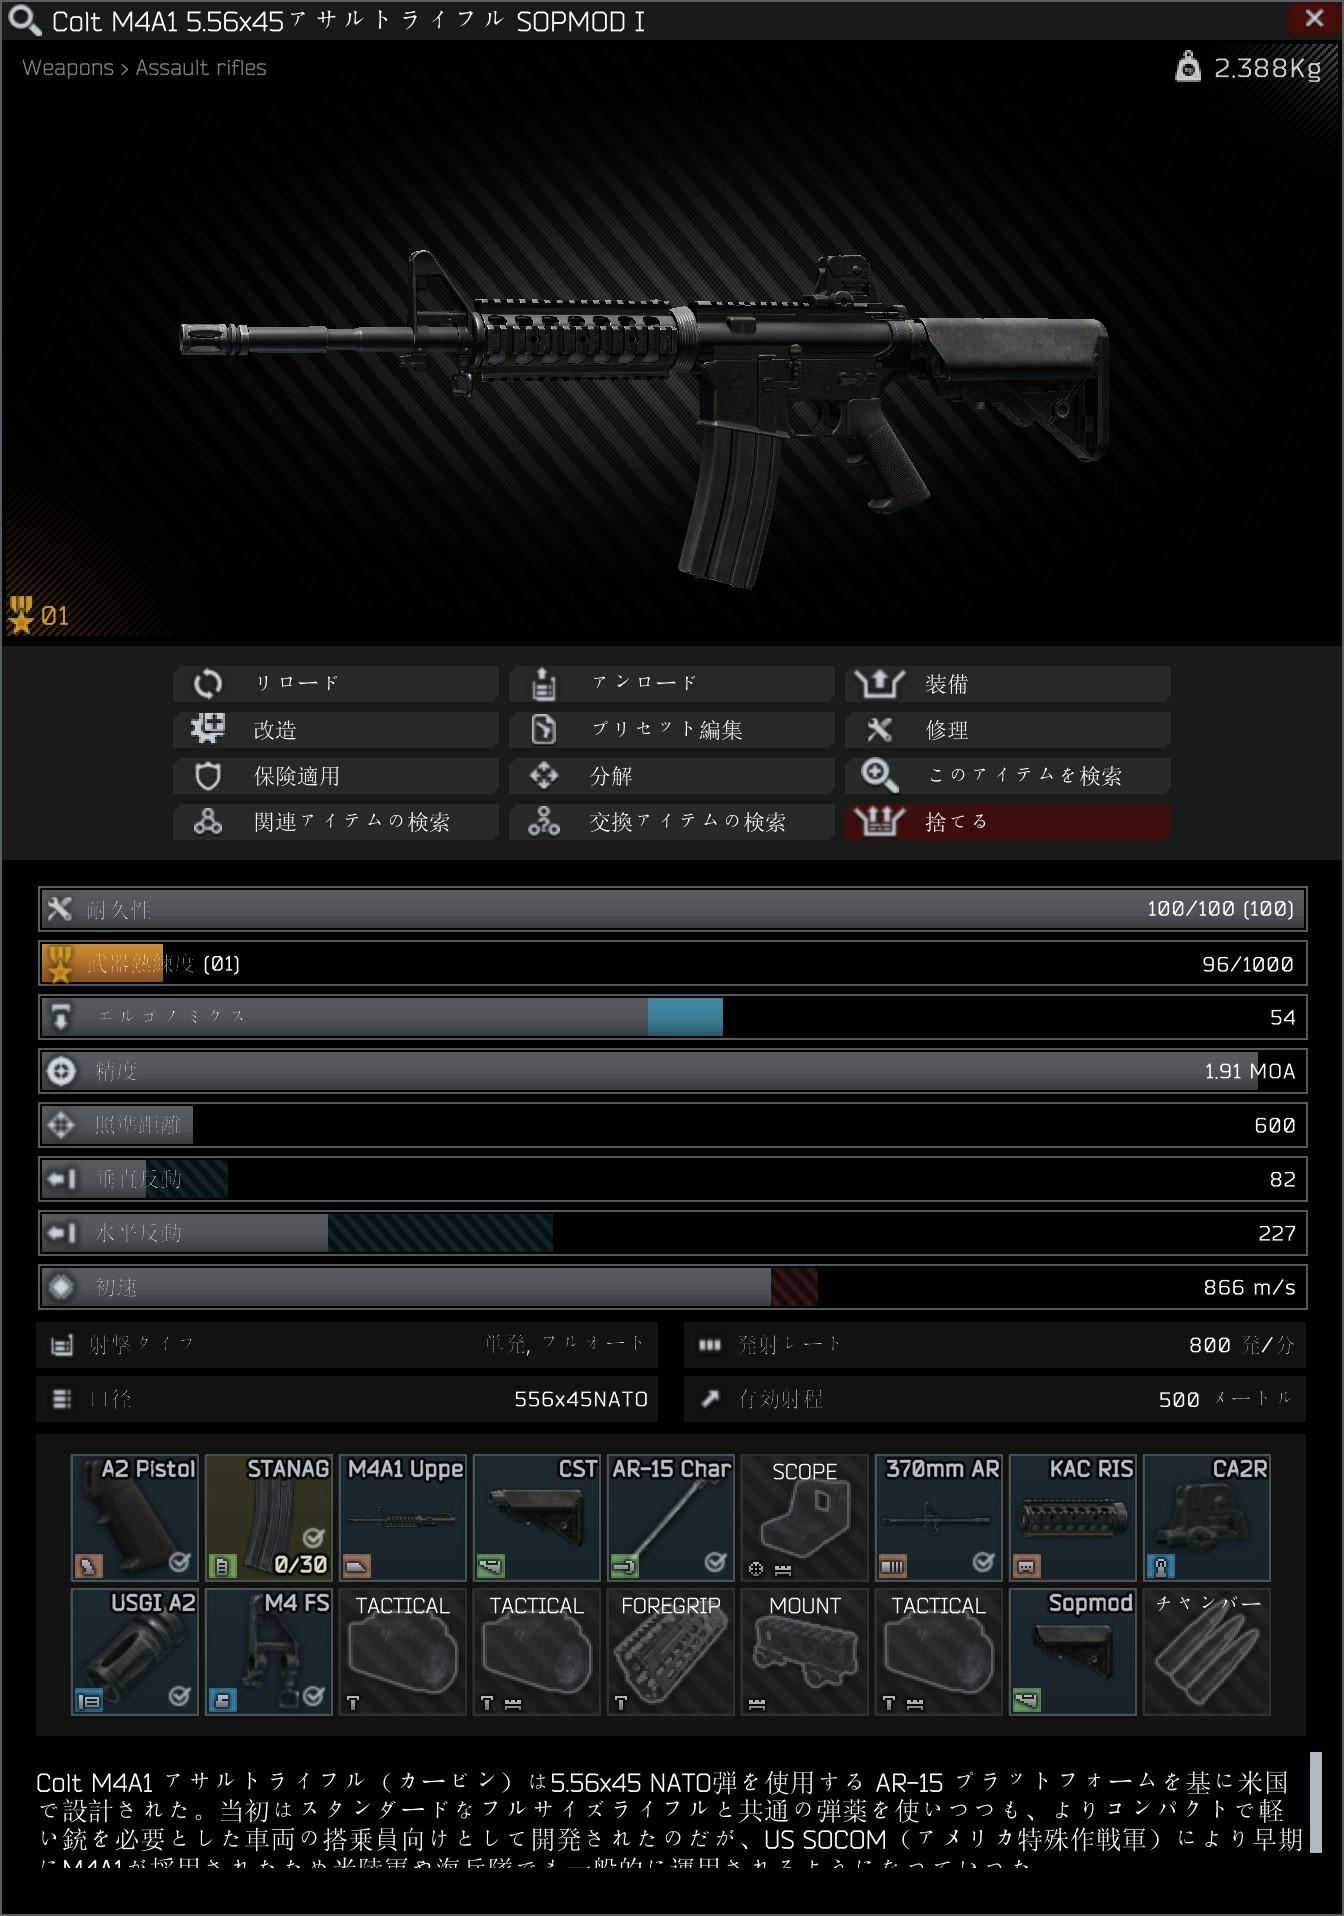 M4A1 SOPMOD1.jpg